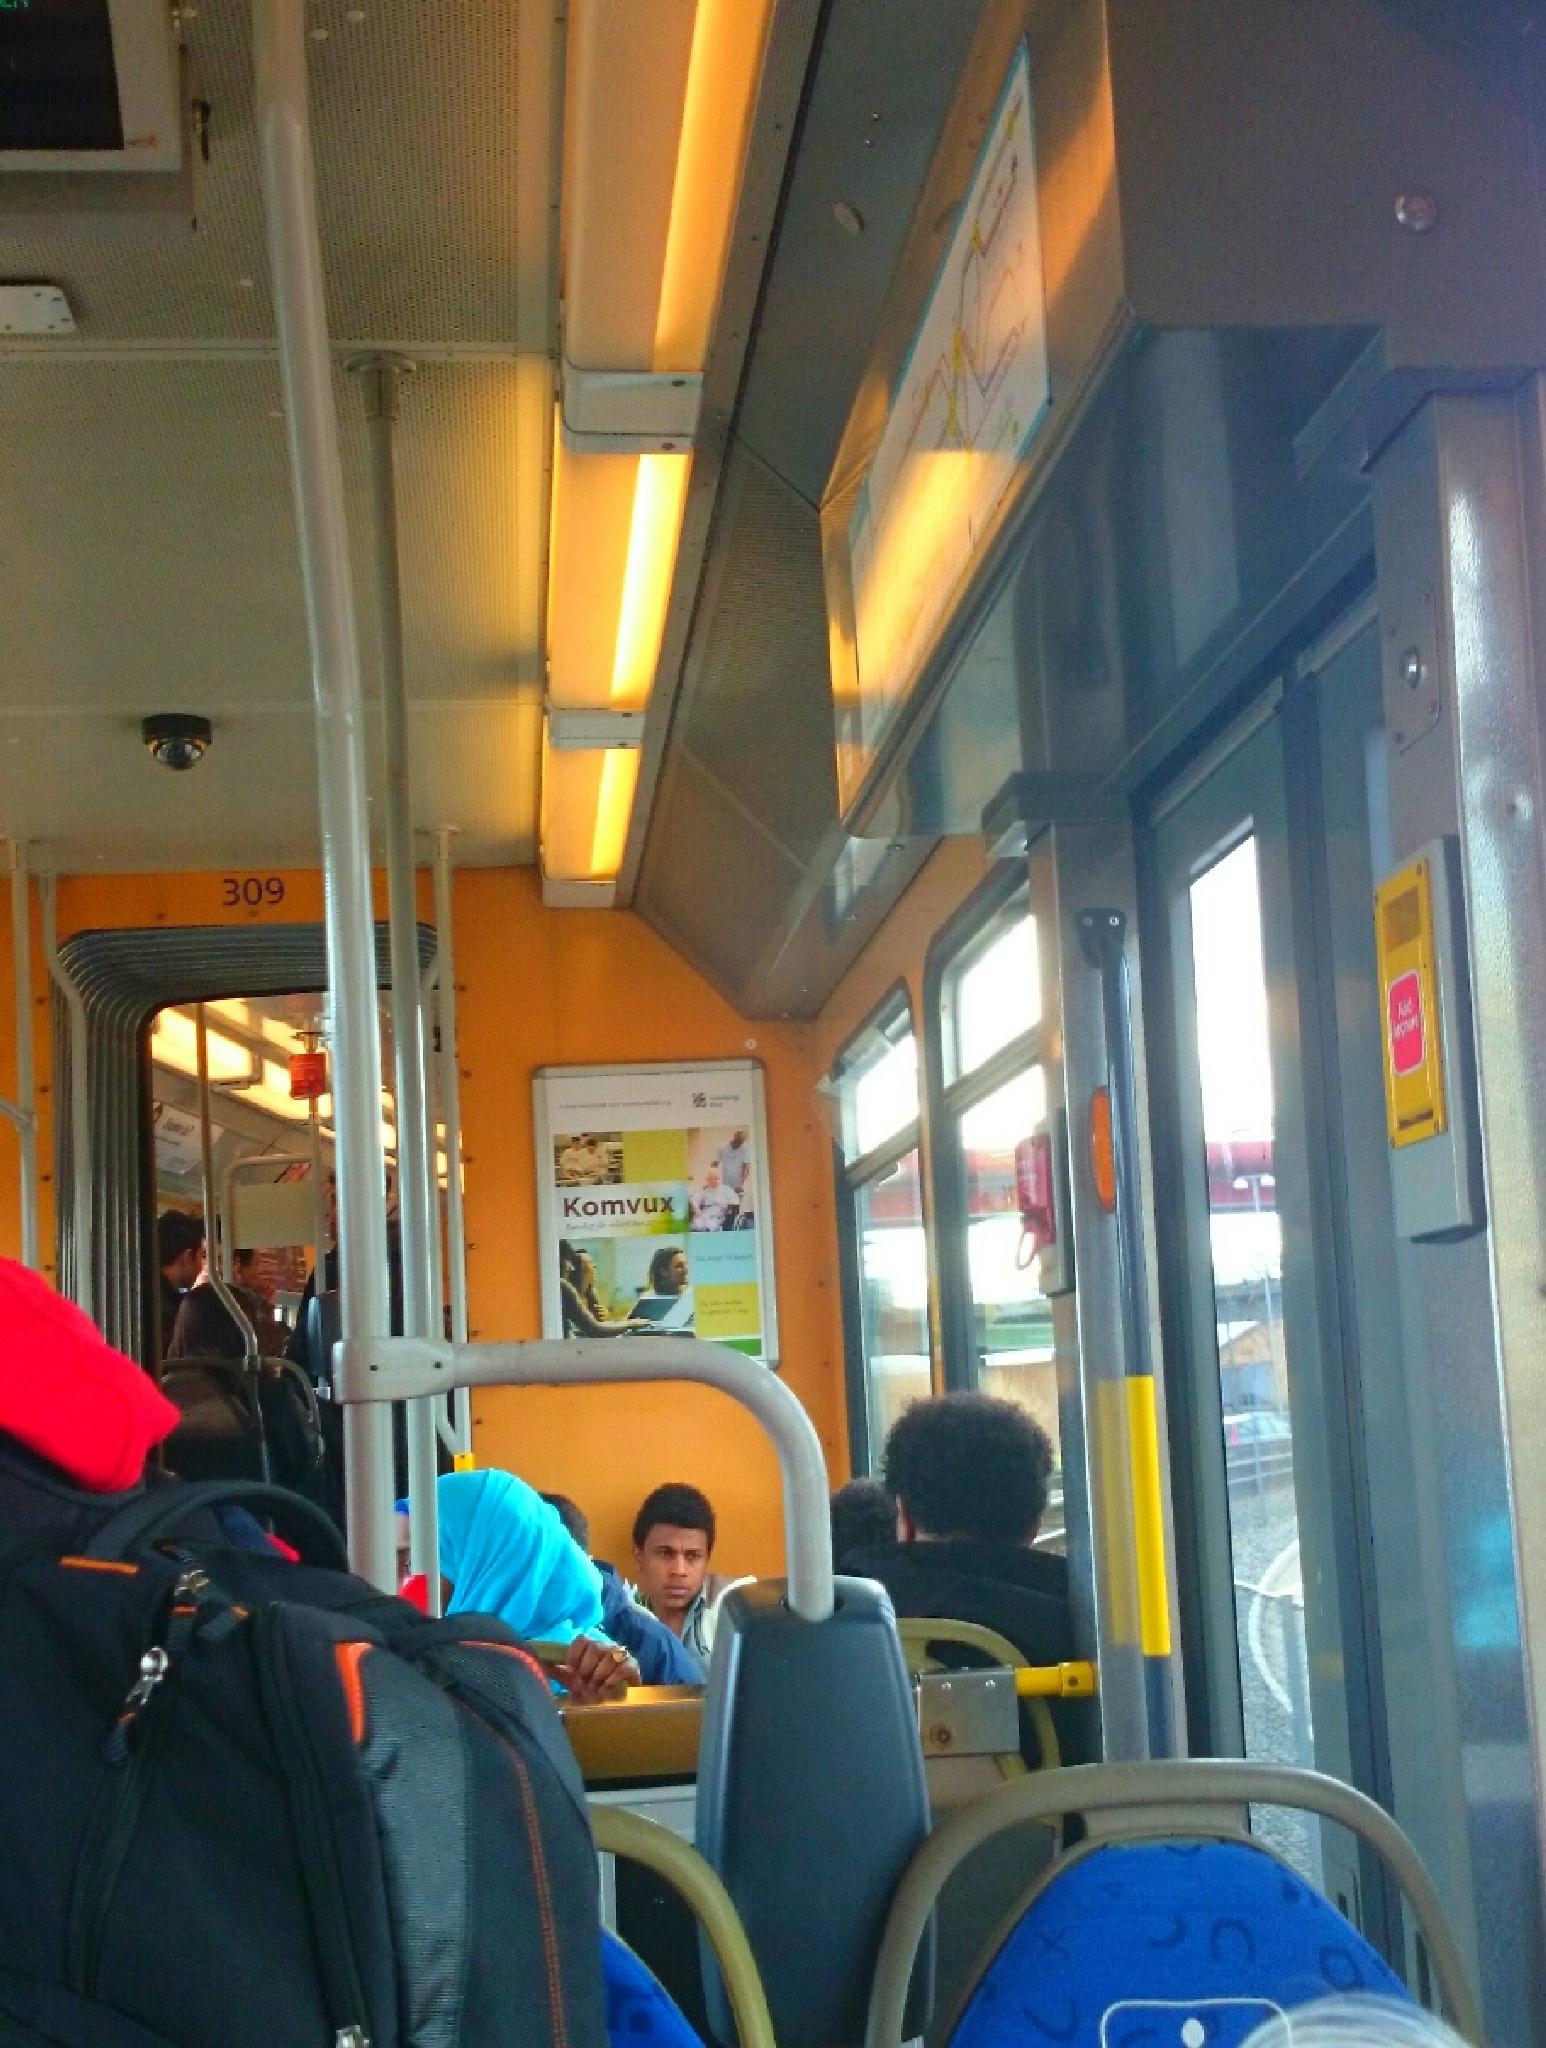 inside the commuter train  by Sherlina